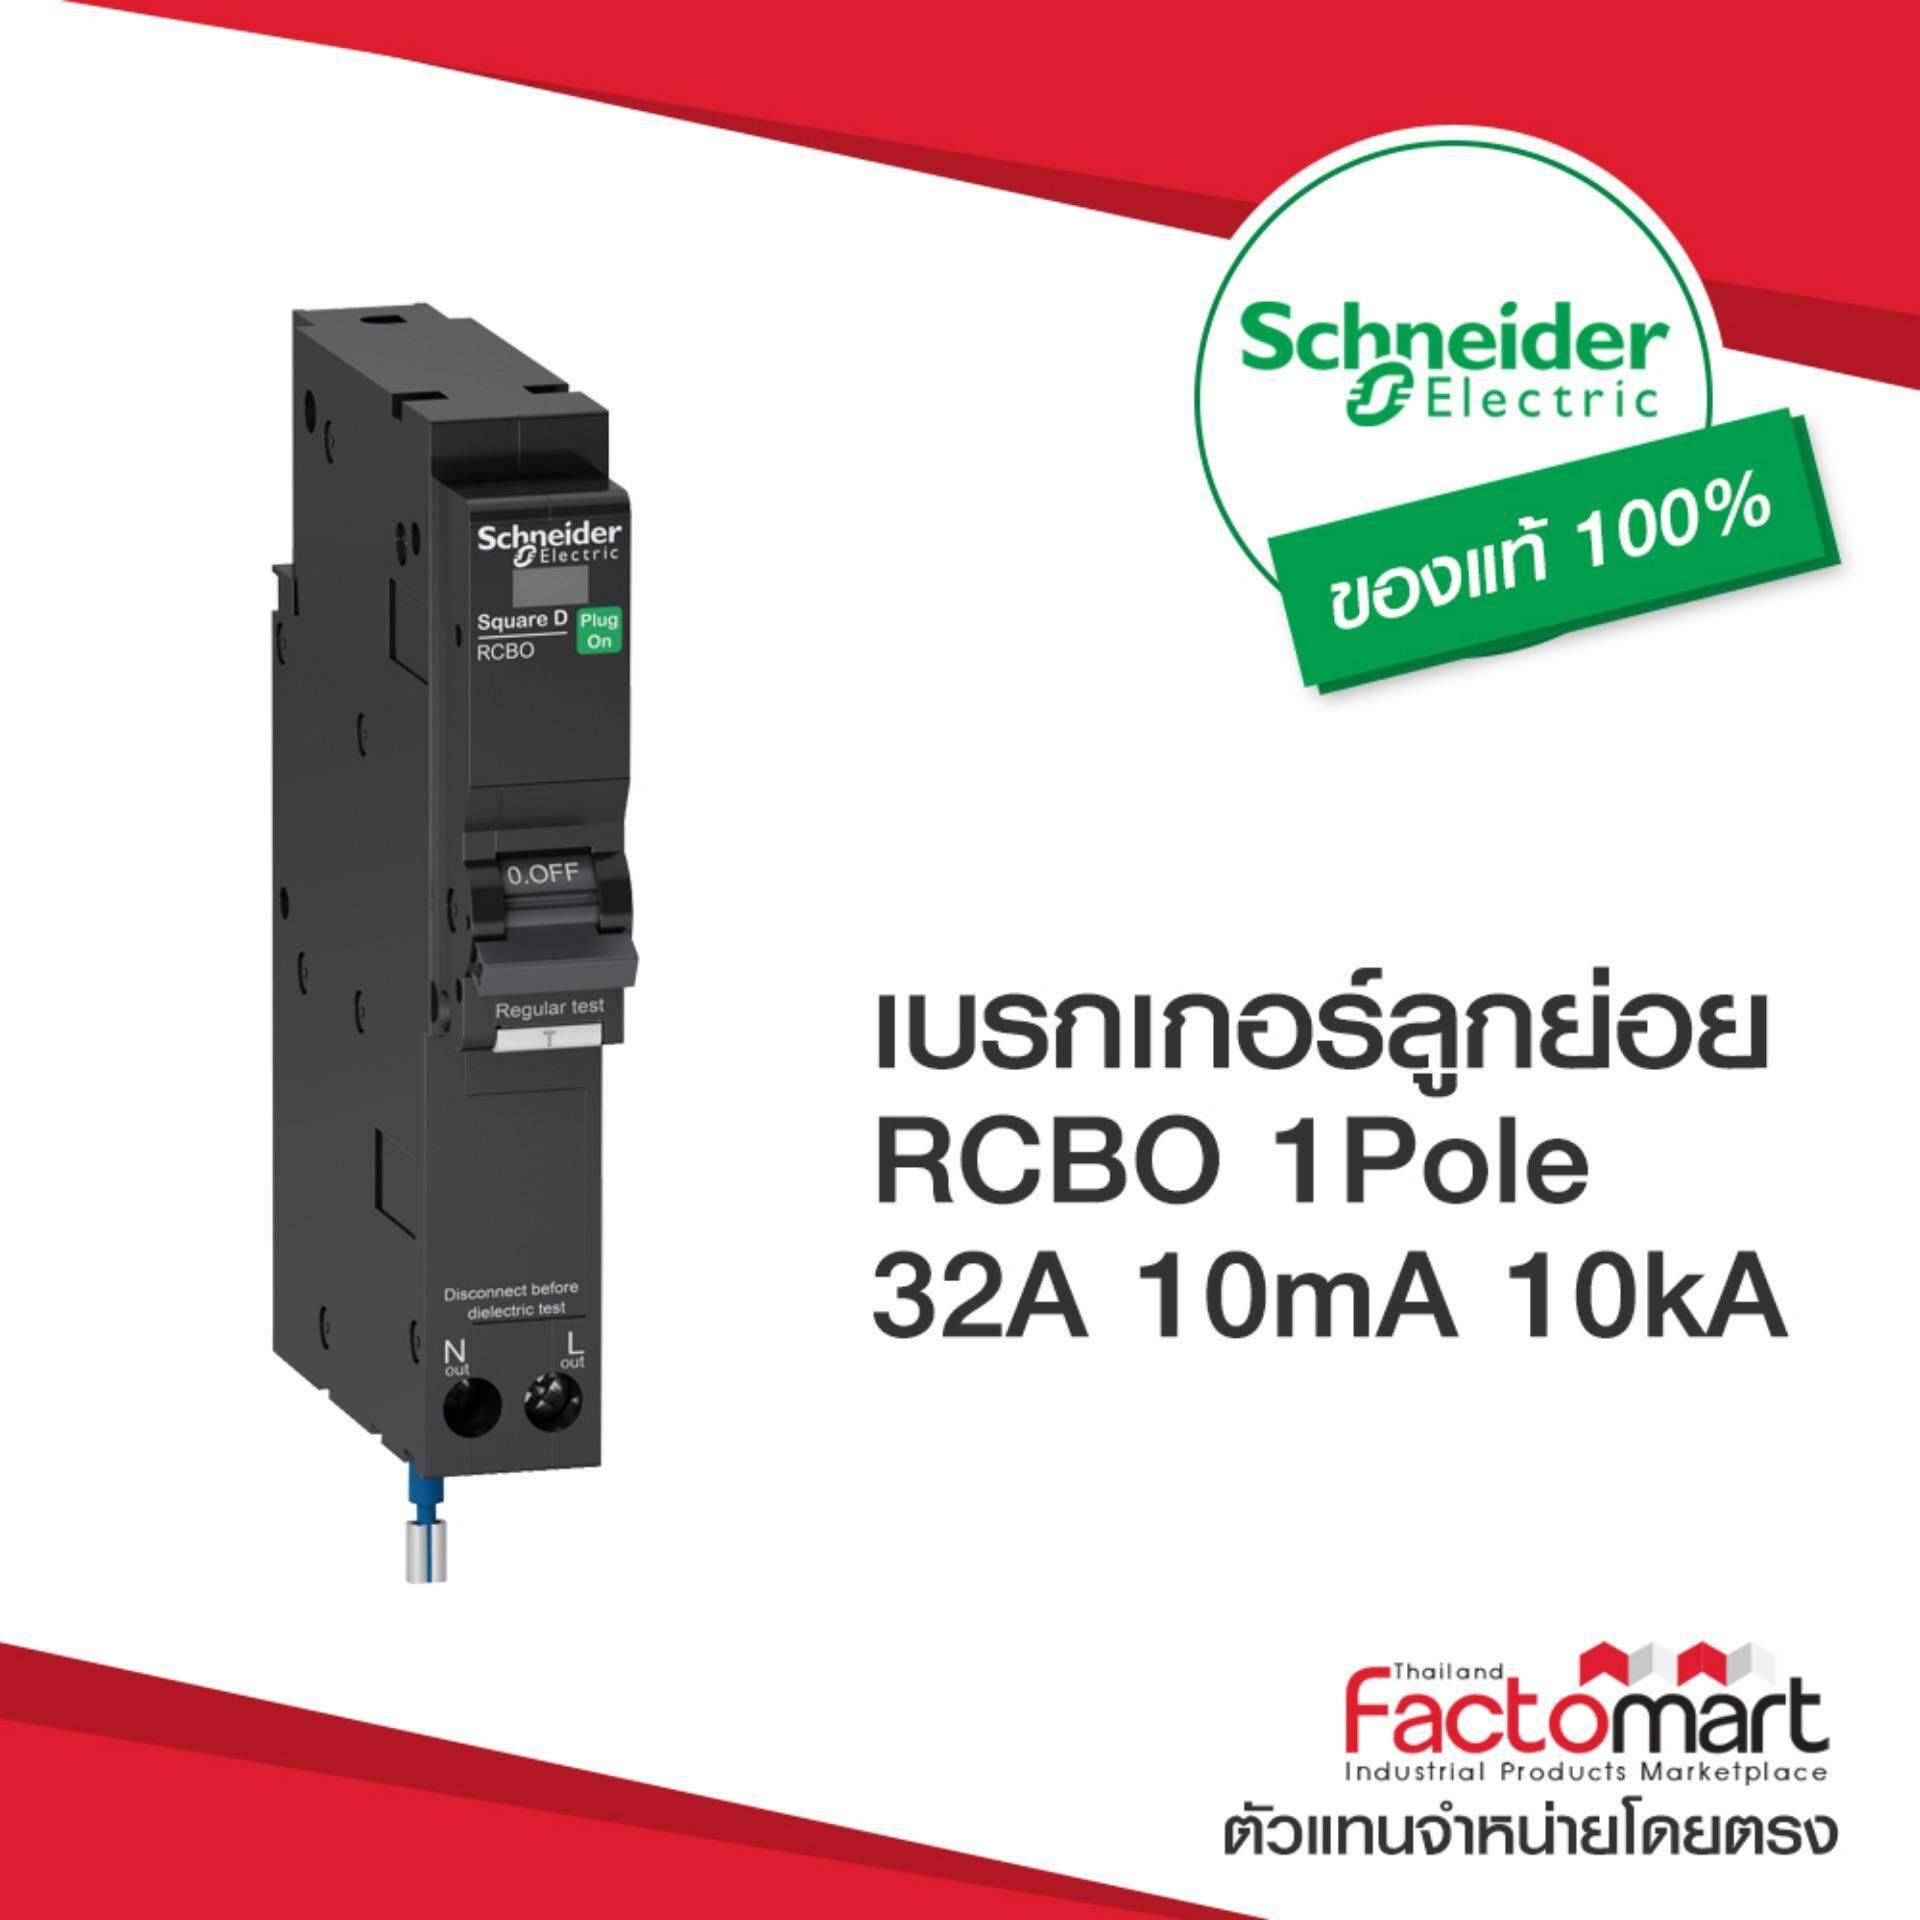 Qo132c10rcbo10 - Schneider - เบรกเกอร์ลูกย่อย Rcbo (เครื่องตัดไฟรั่ว / ไฟดูด) - จำหน่ายโดย Factomart.com - Qovs 1 Pole, 32a ตรวจจับกระแสไฟฟ้ารั่ว 10ma - พิกัดทนกระแสลัดวงจร (icu) 10ka.